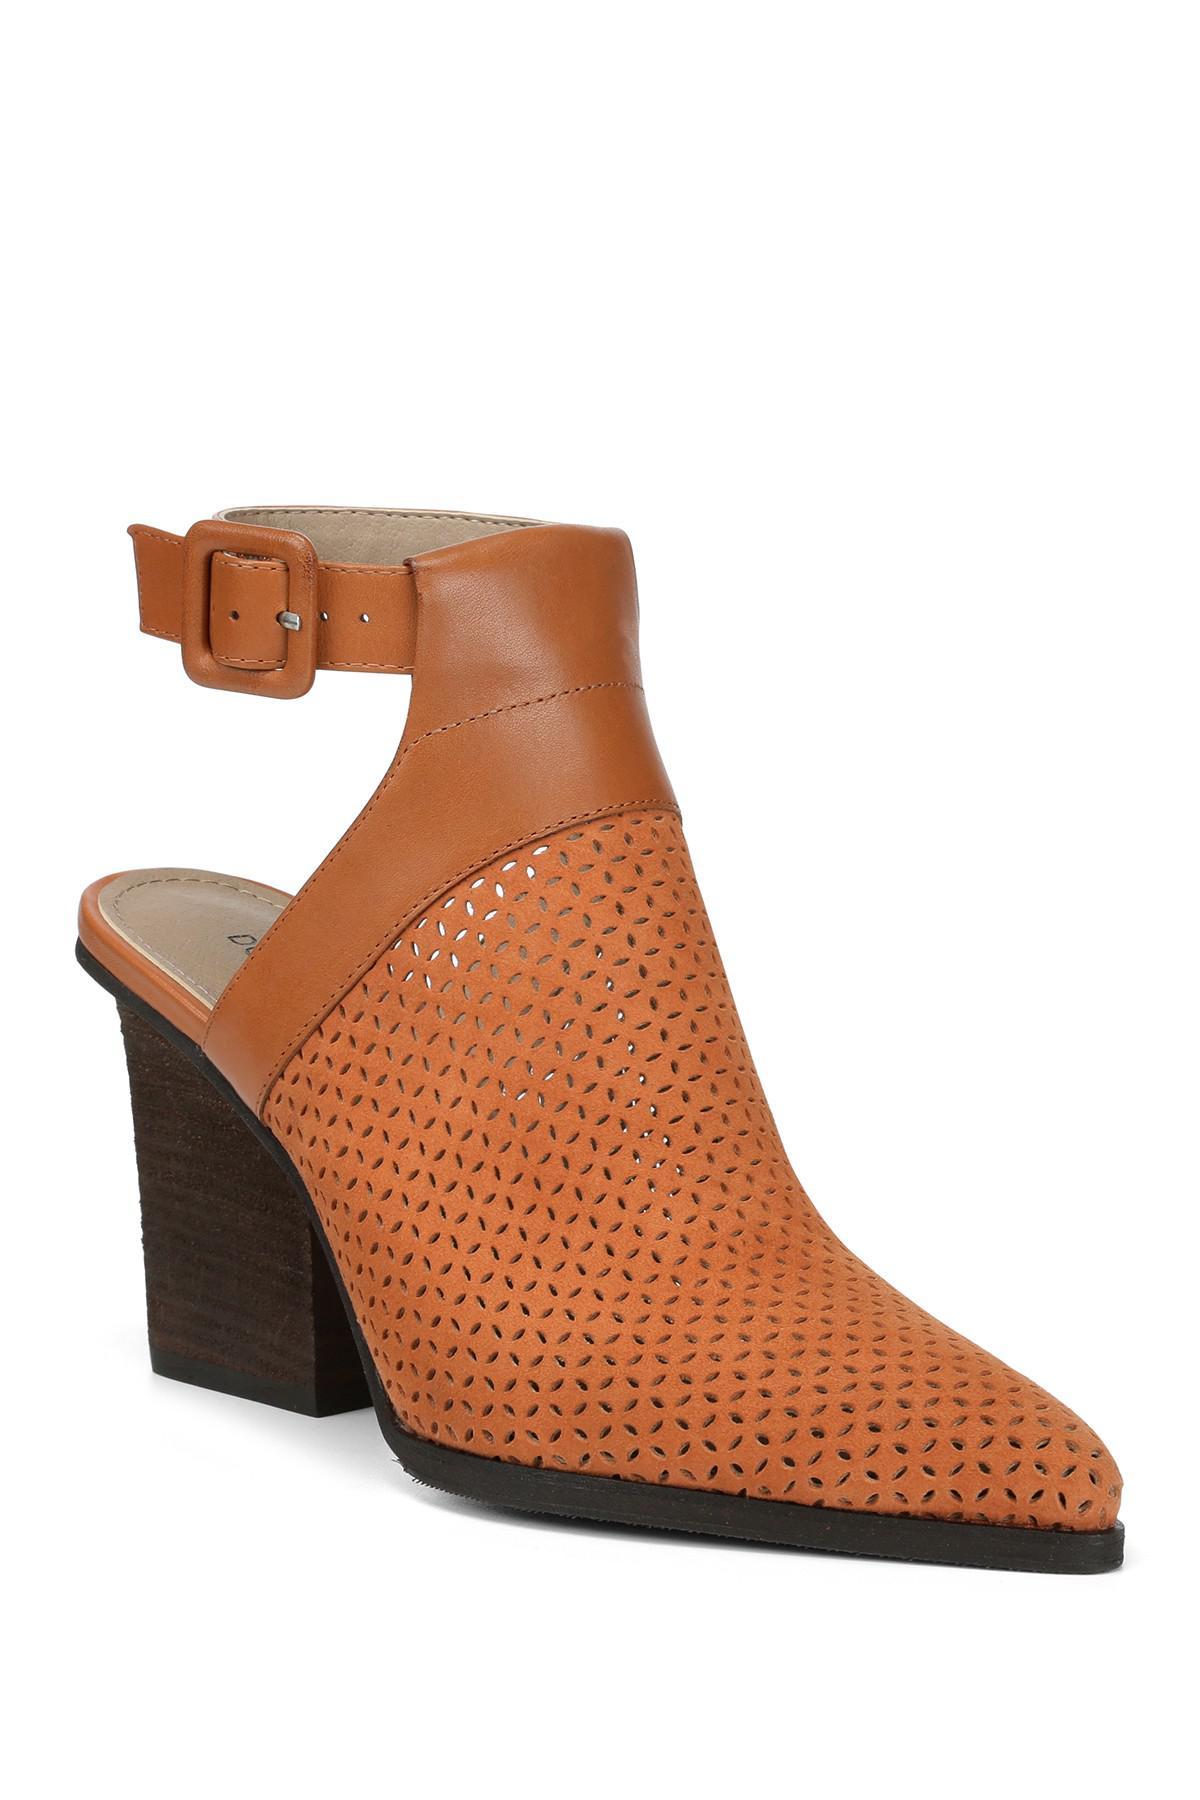 9041703f396 Donald J Pliner - Brown Varen Heel Cutout Perforated Bootie - Lyst. View  fullscreen